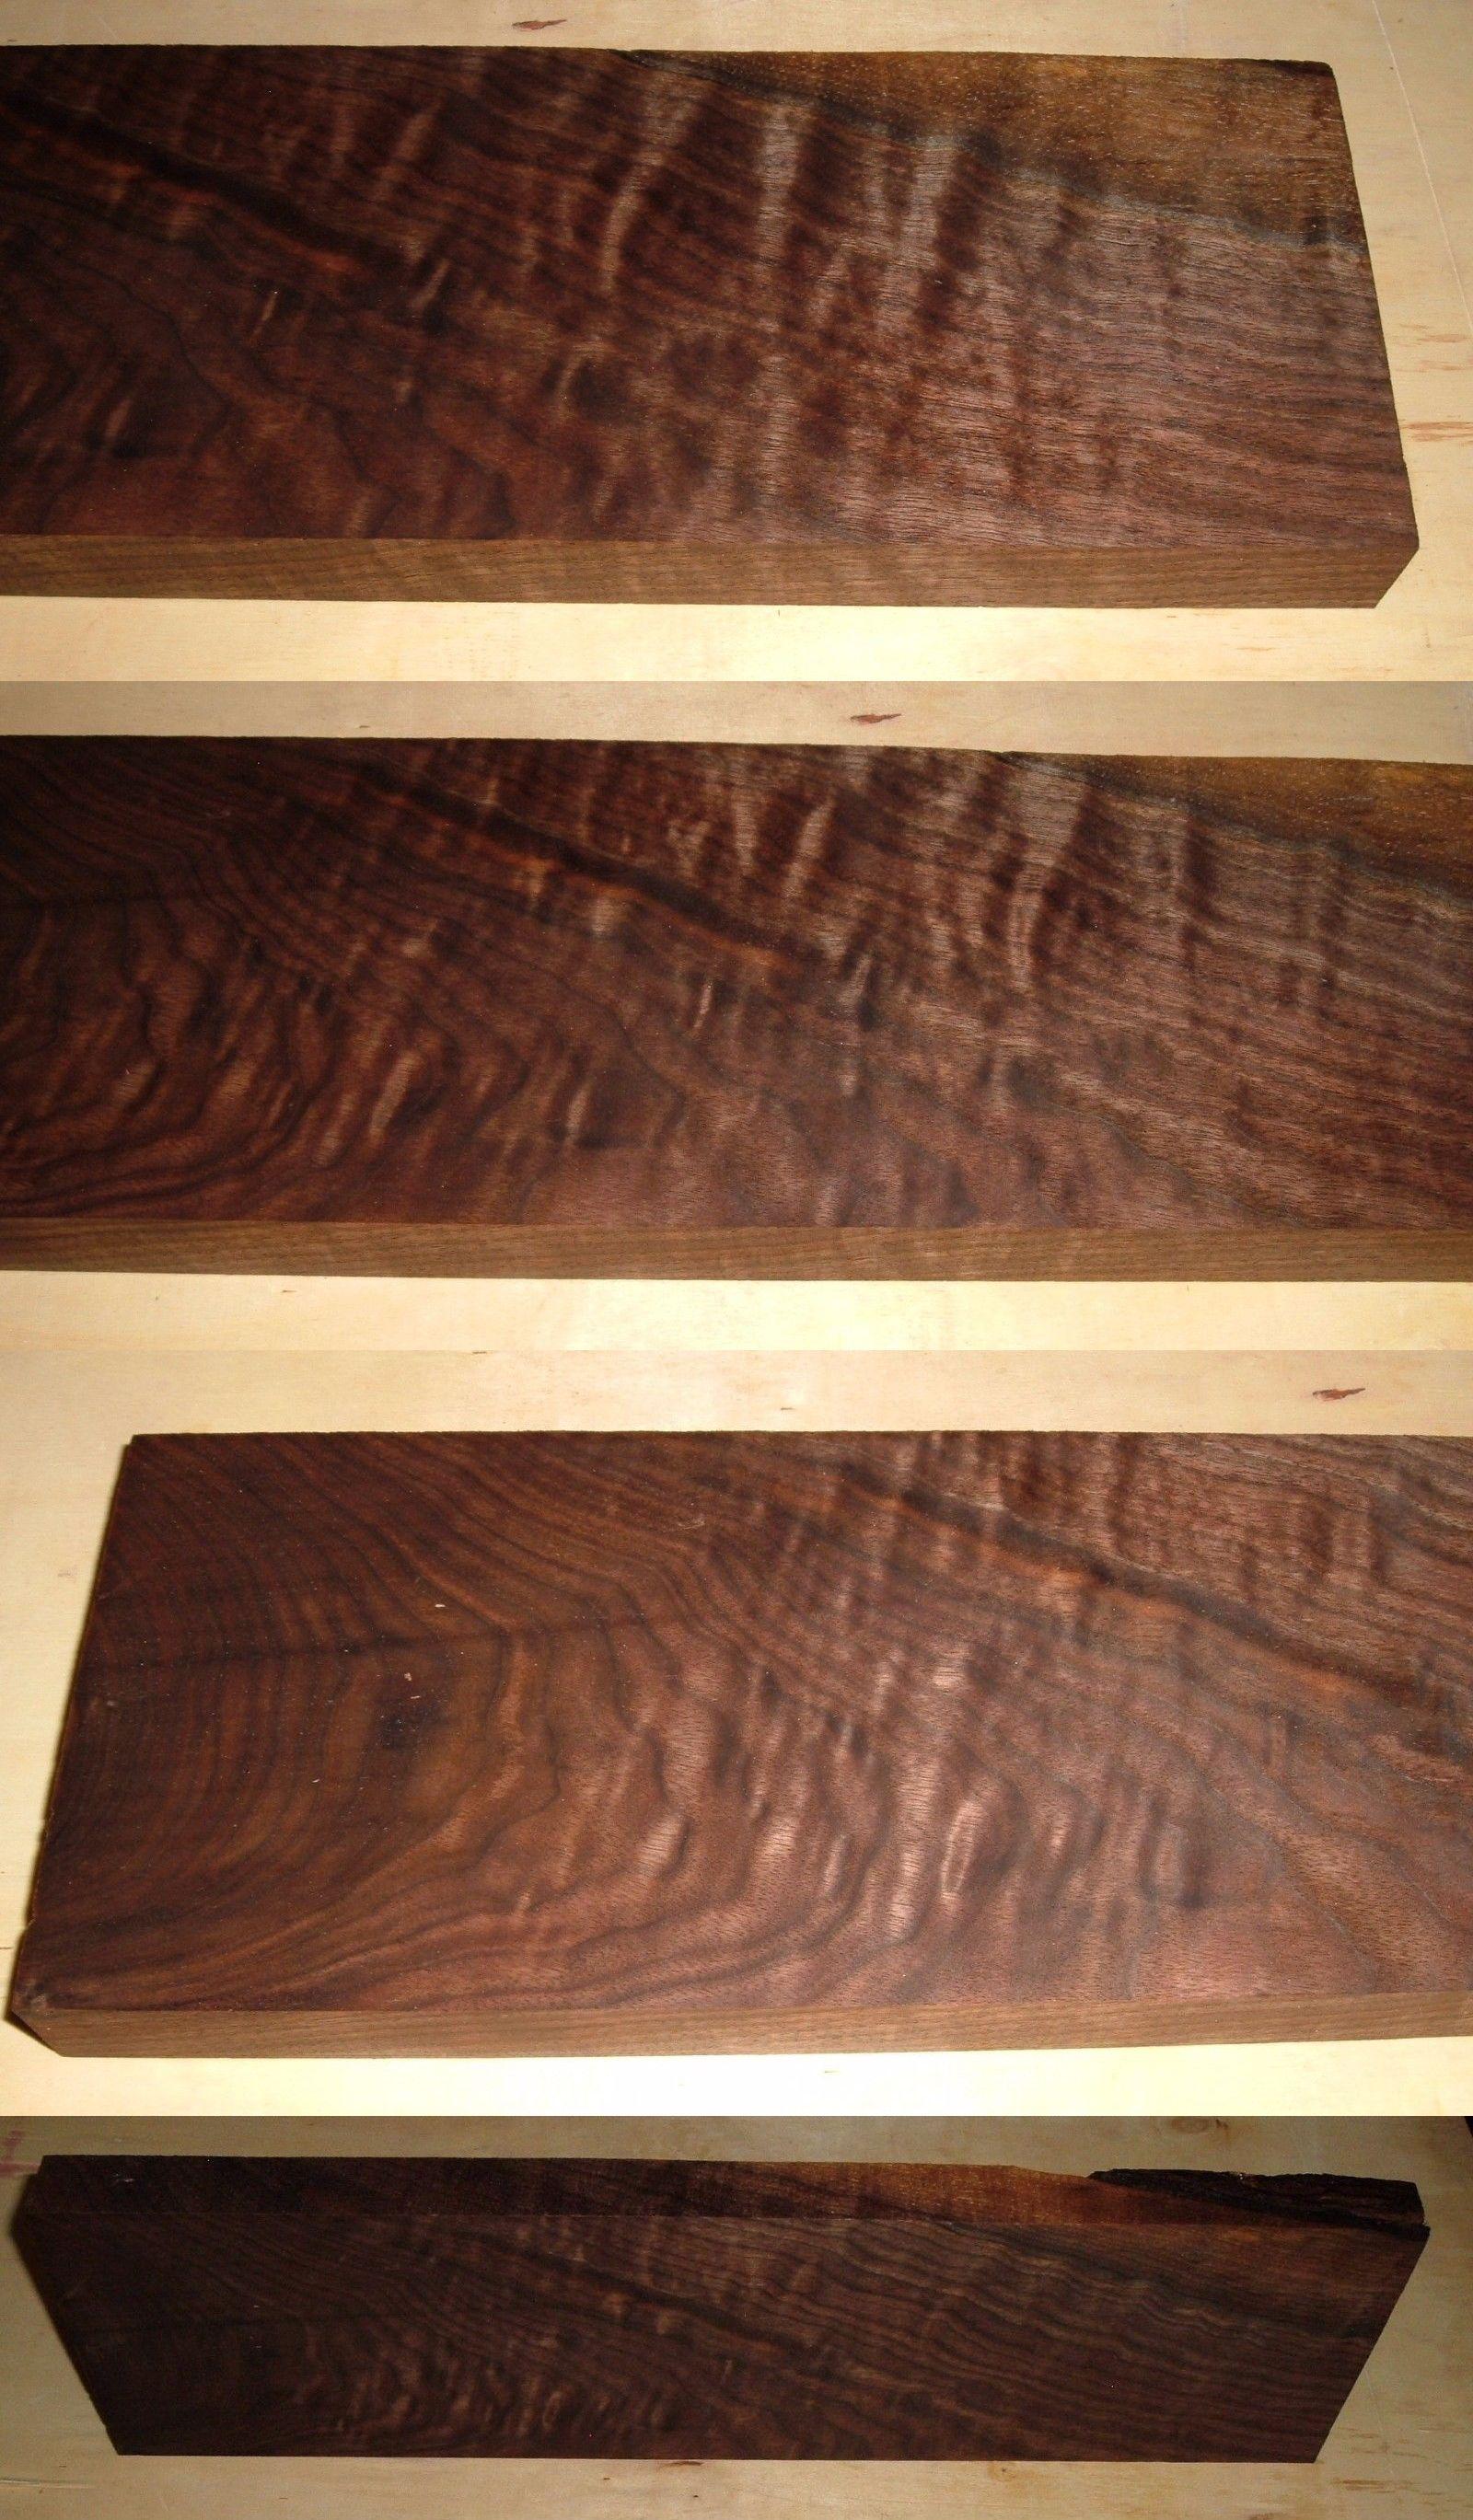 Woodworking Lumber 84011 1 1 8 X5 1 4 X19 4 4 Curly Figure Black Walnut Lumber Craft Board Wood Bws 542 Buy It Now On Woodworking Lumber 84011 Black Walnut Lumber Wood Woodworking